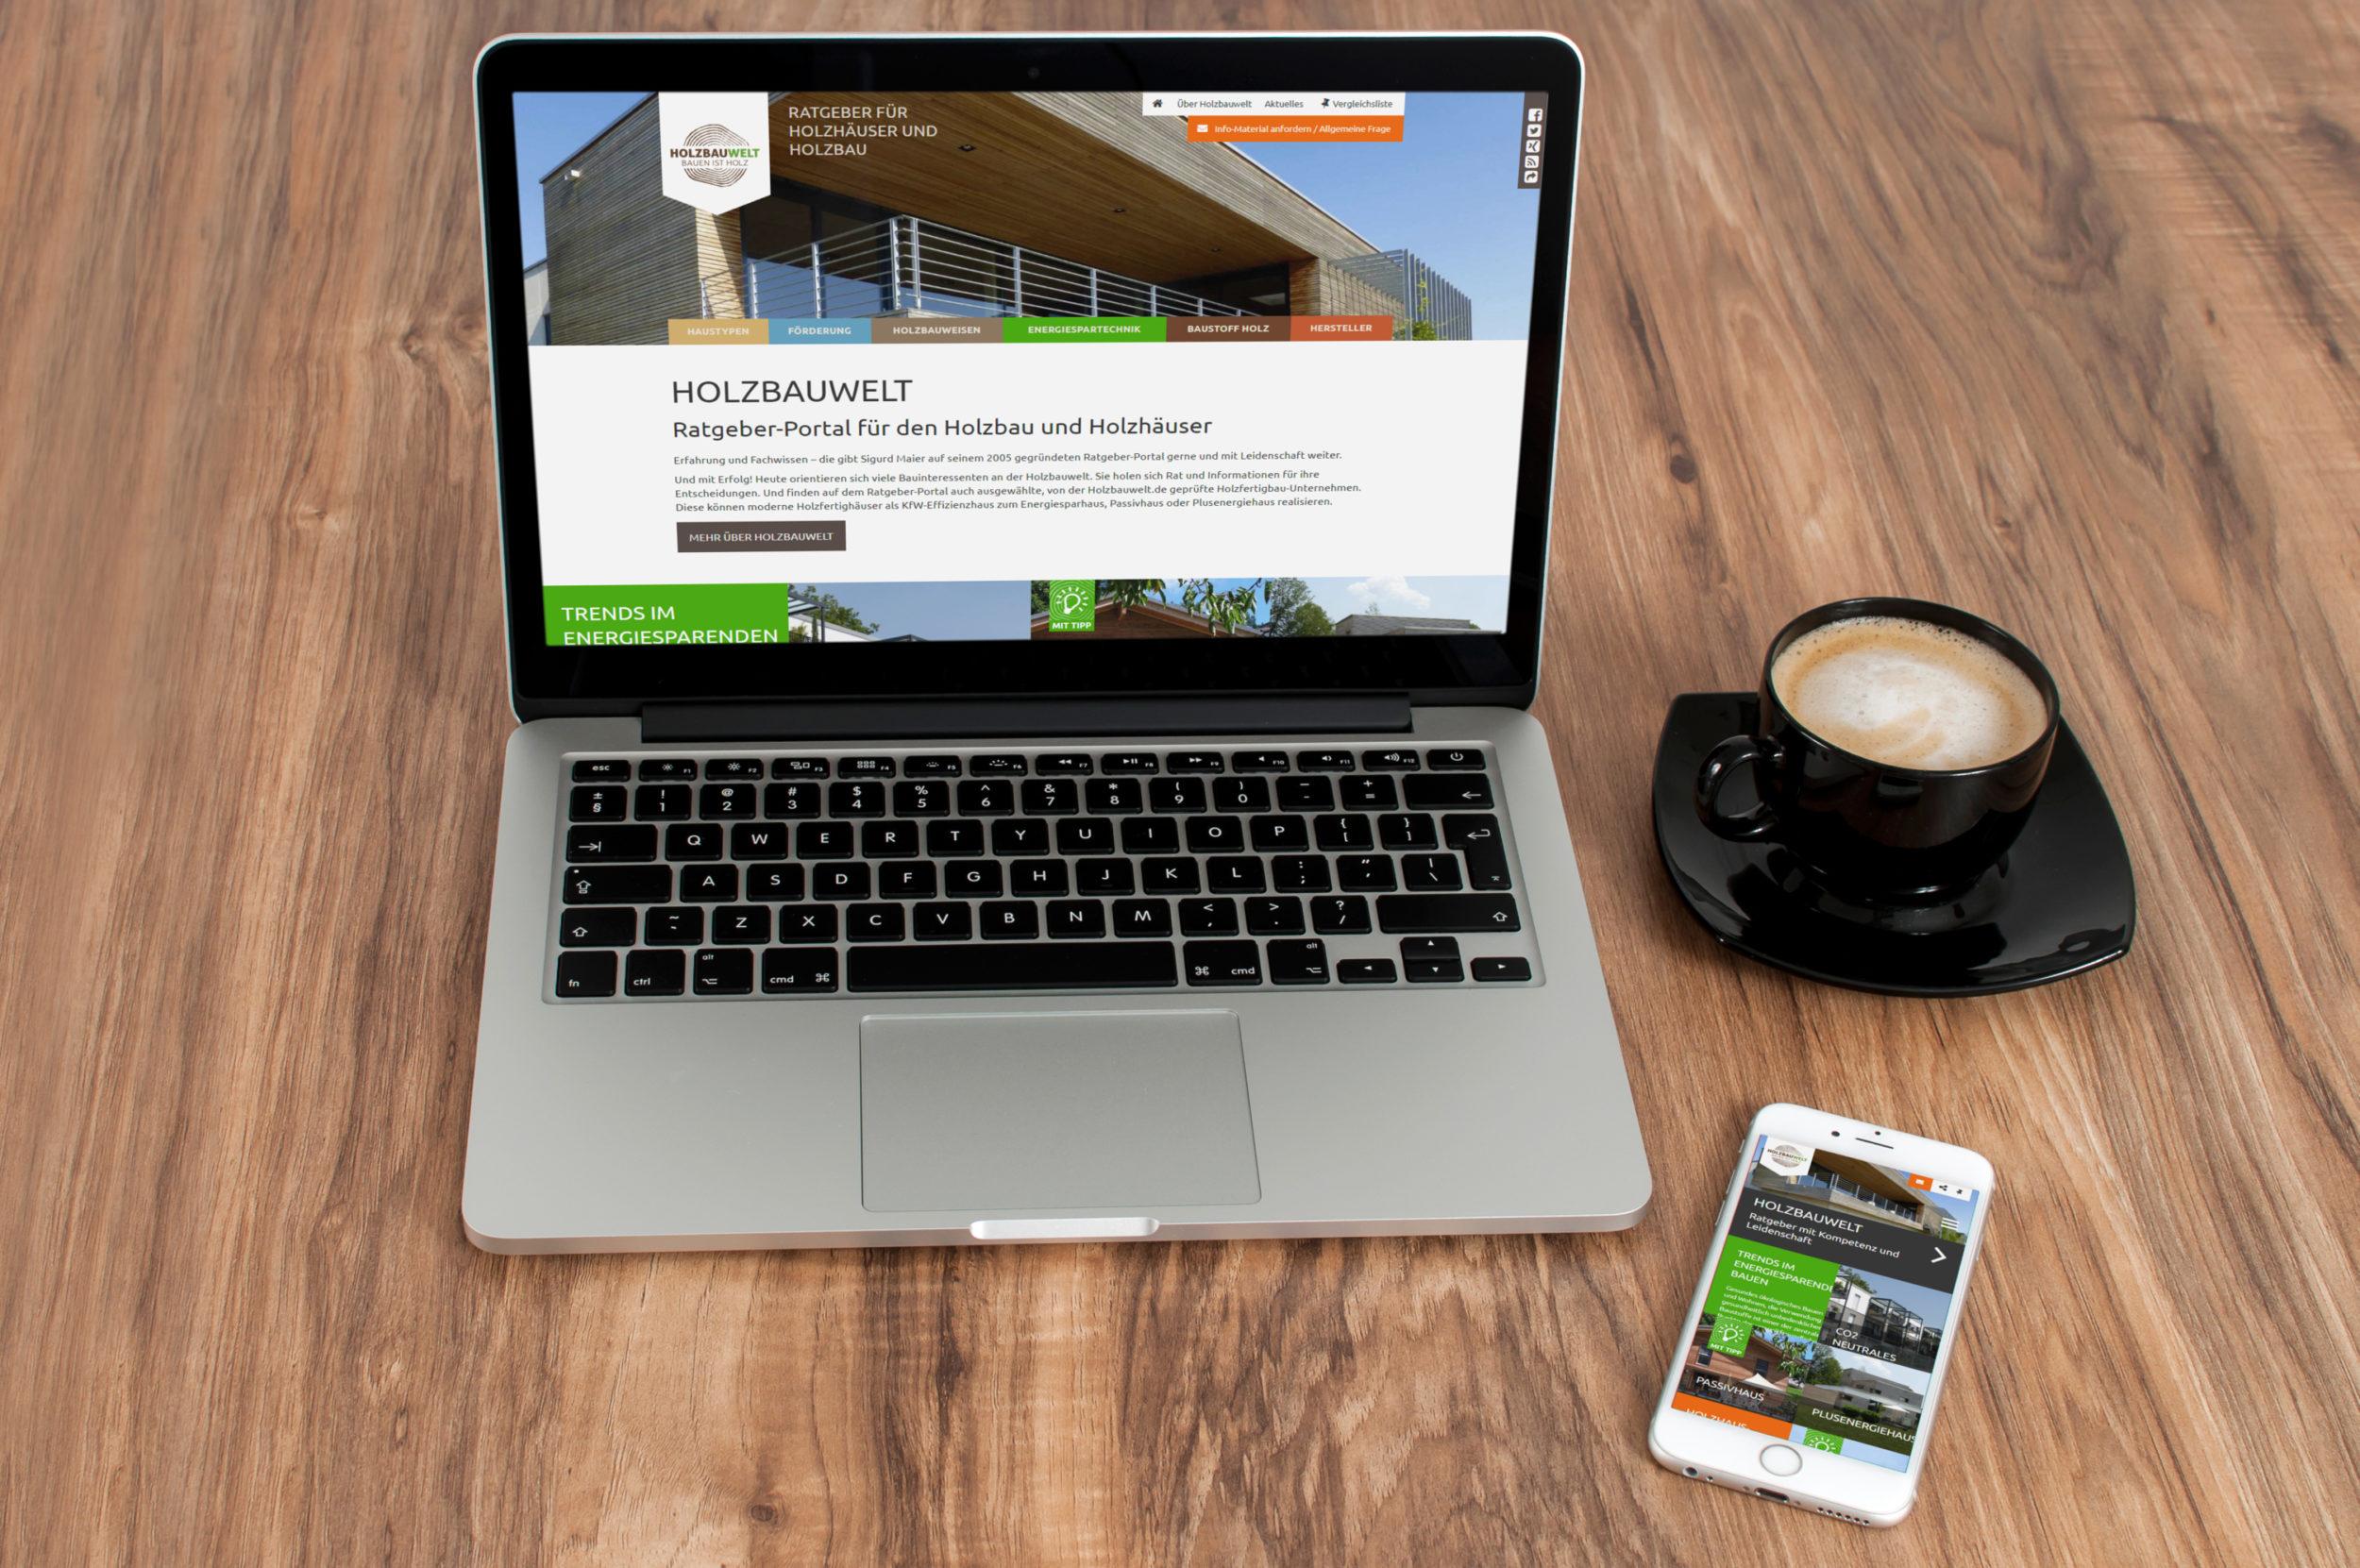 Holzbauwelt.de Ratgeber-Portal für Holzbau und Holzhäuser